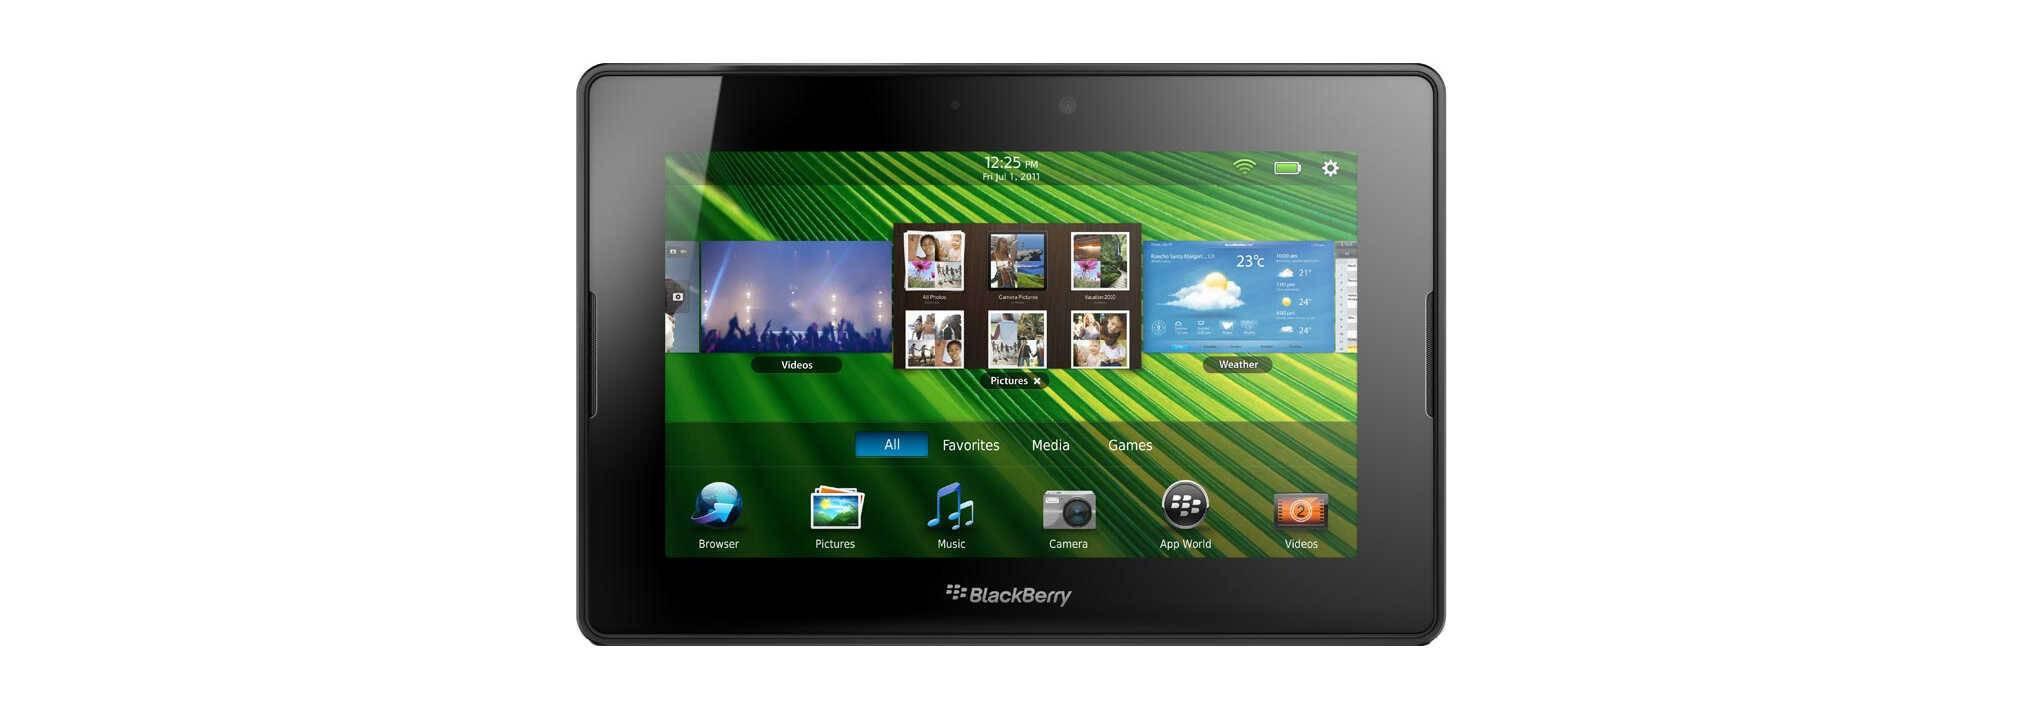 BlackBerry's PlayBook tablet